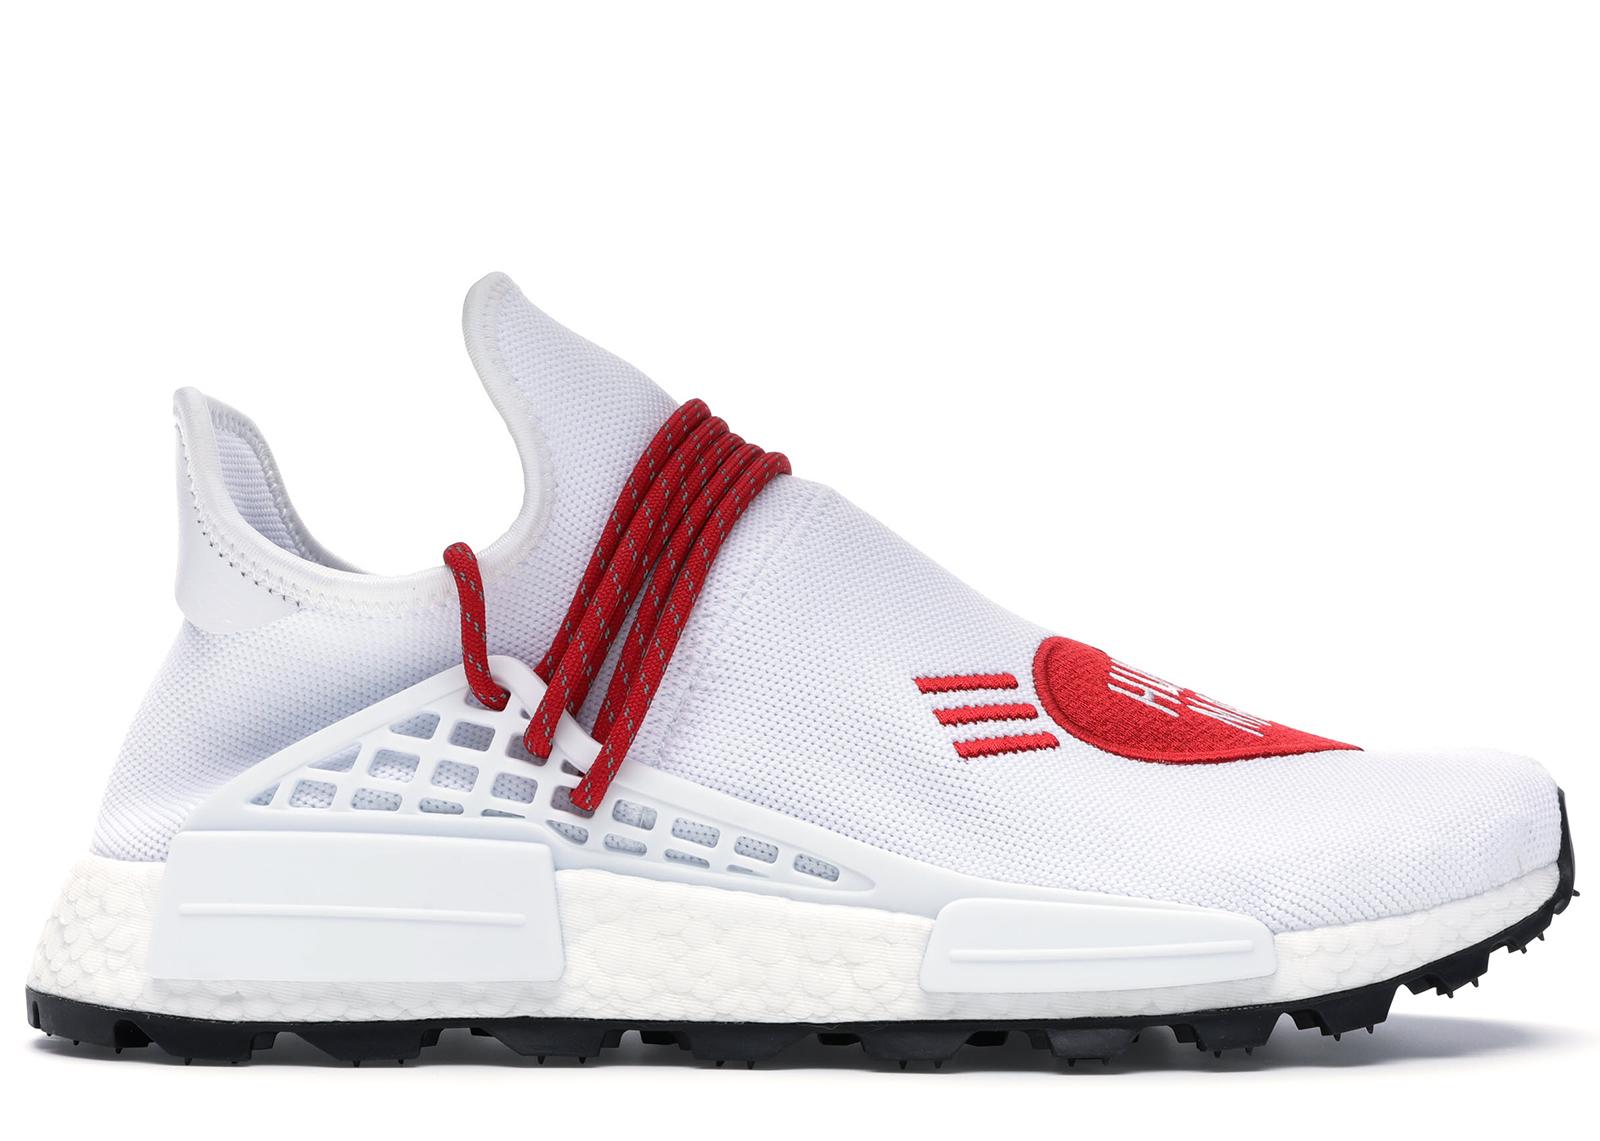 adidas nmds limited edition